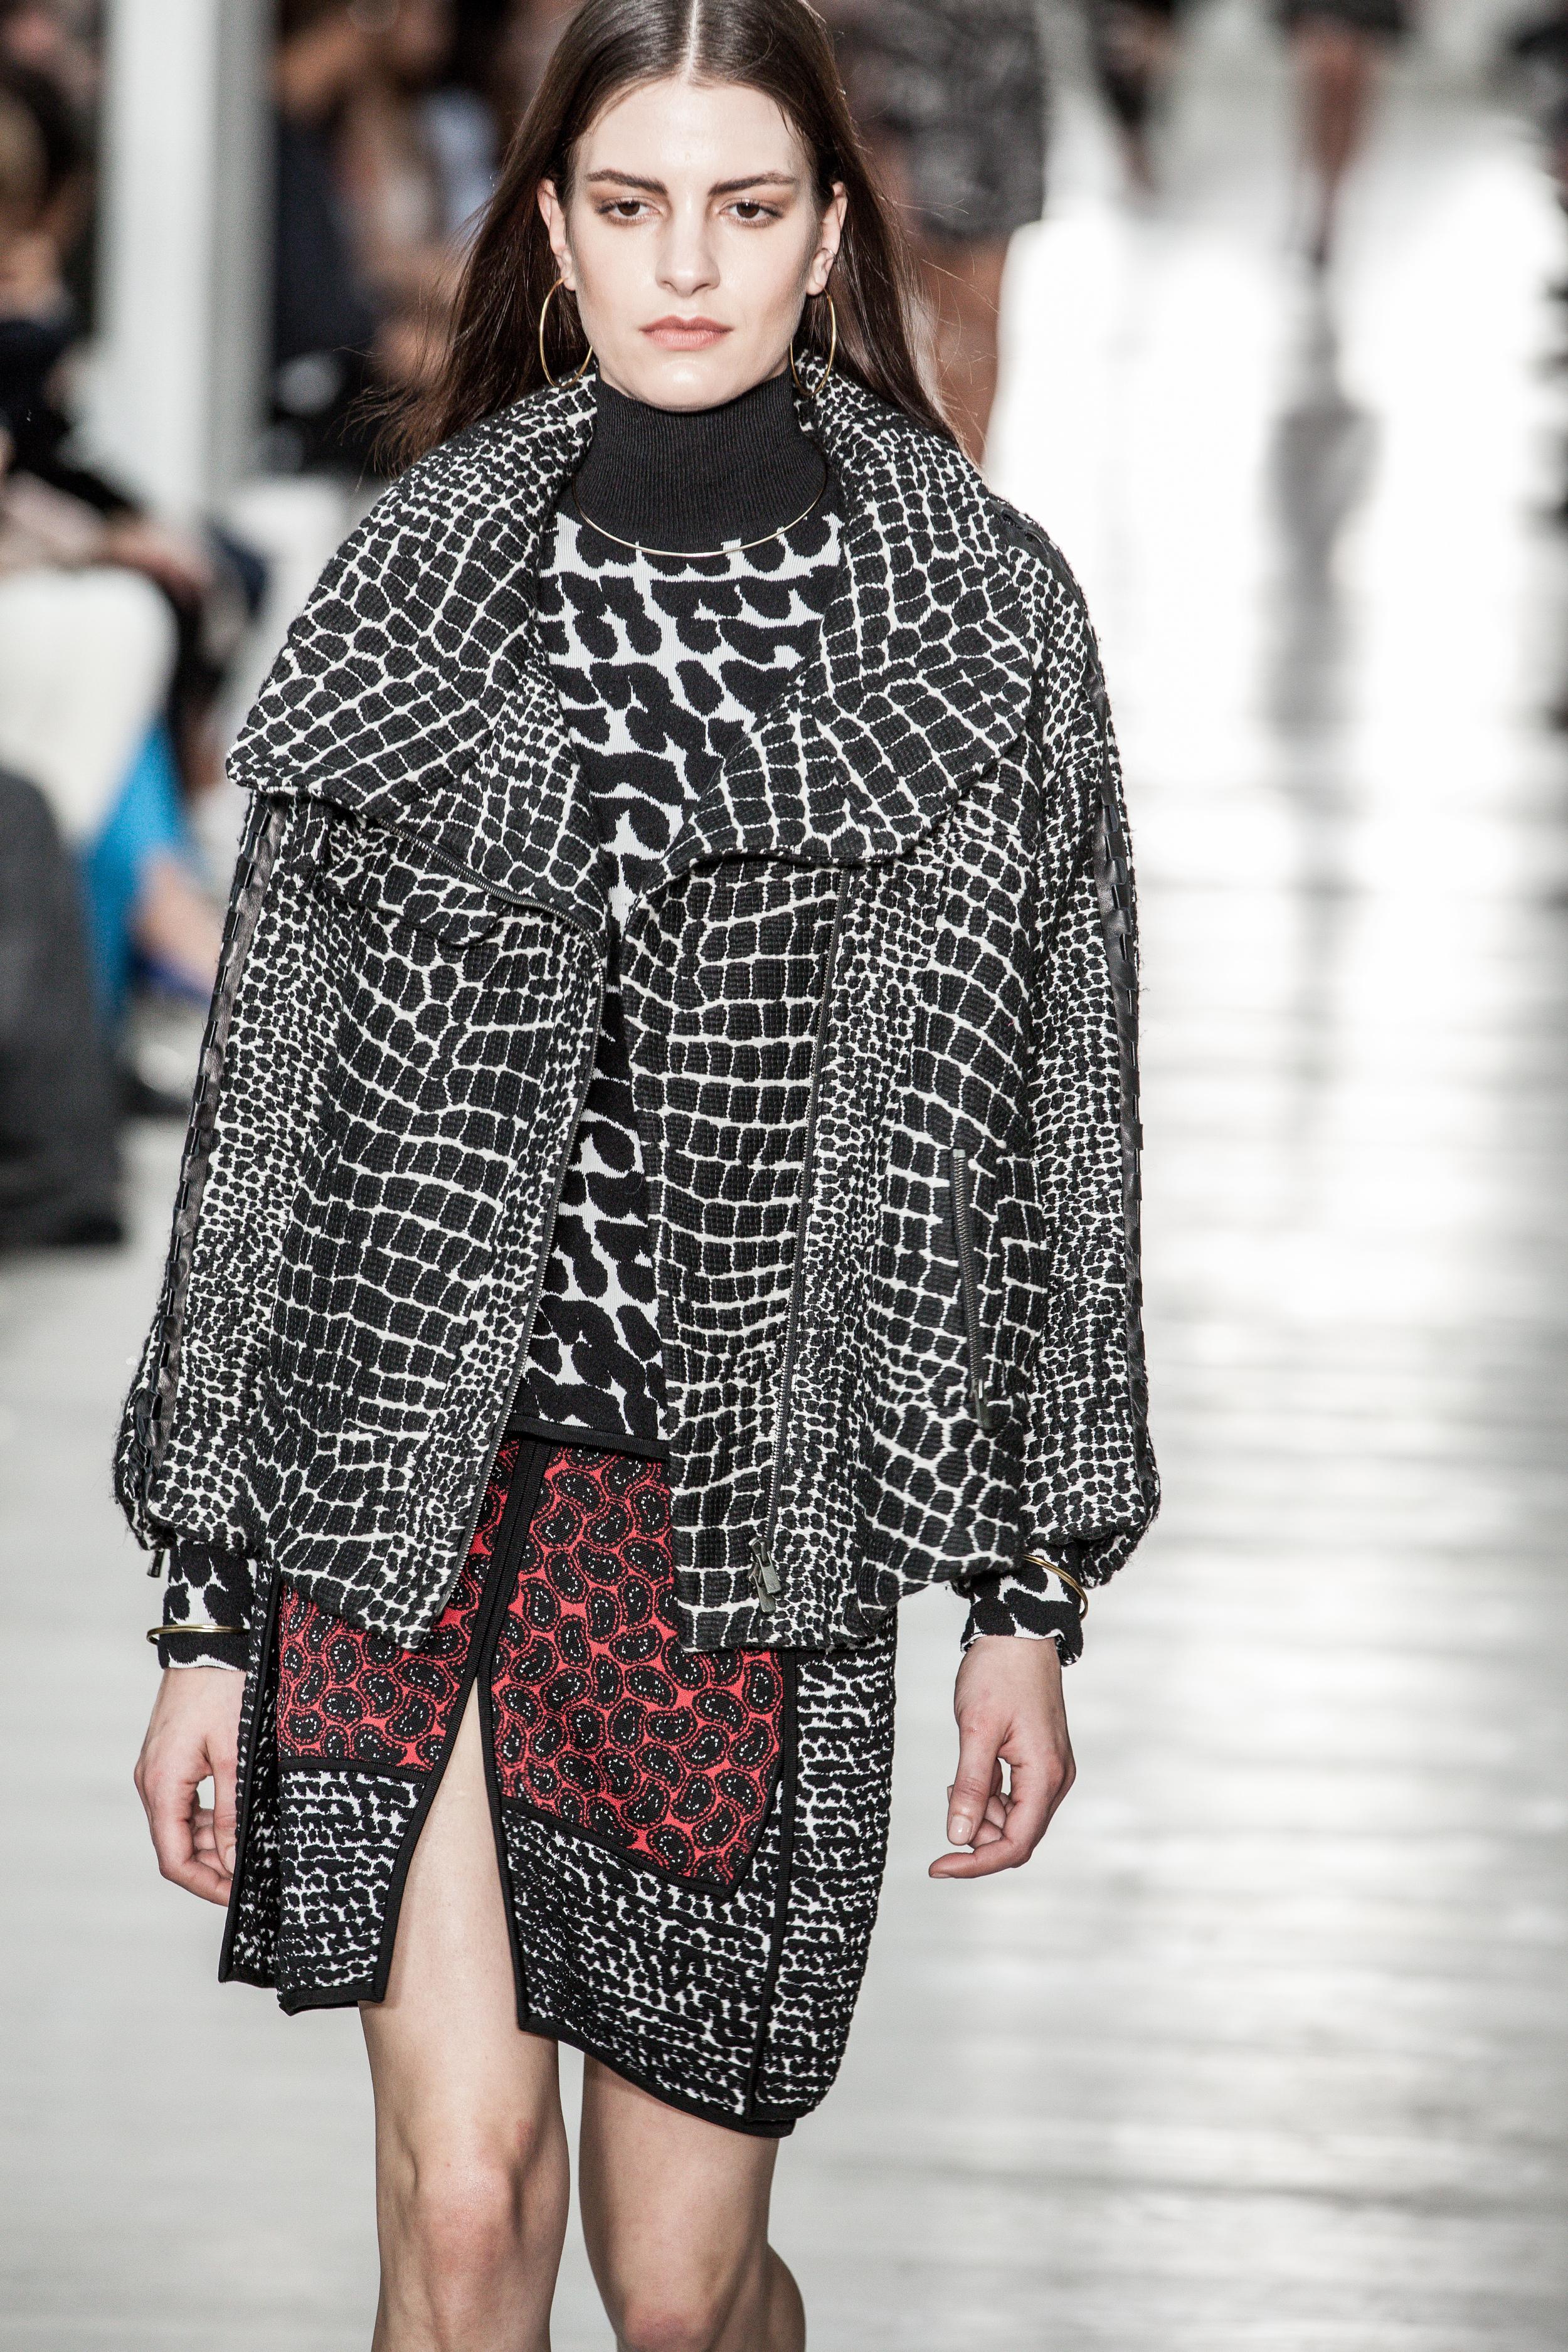 London_Fashion_Week_by_Sam_Geals_InlineSix_Photography0801.jpg